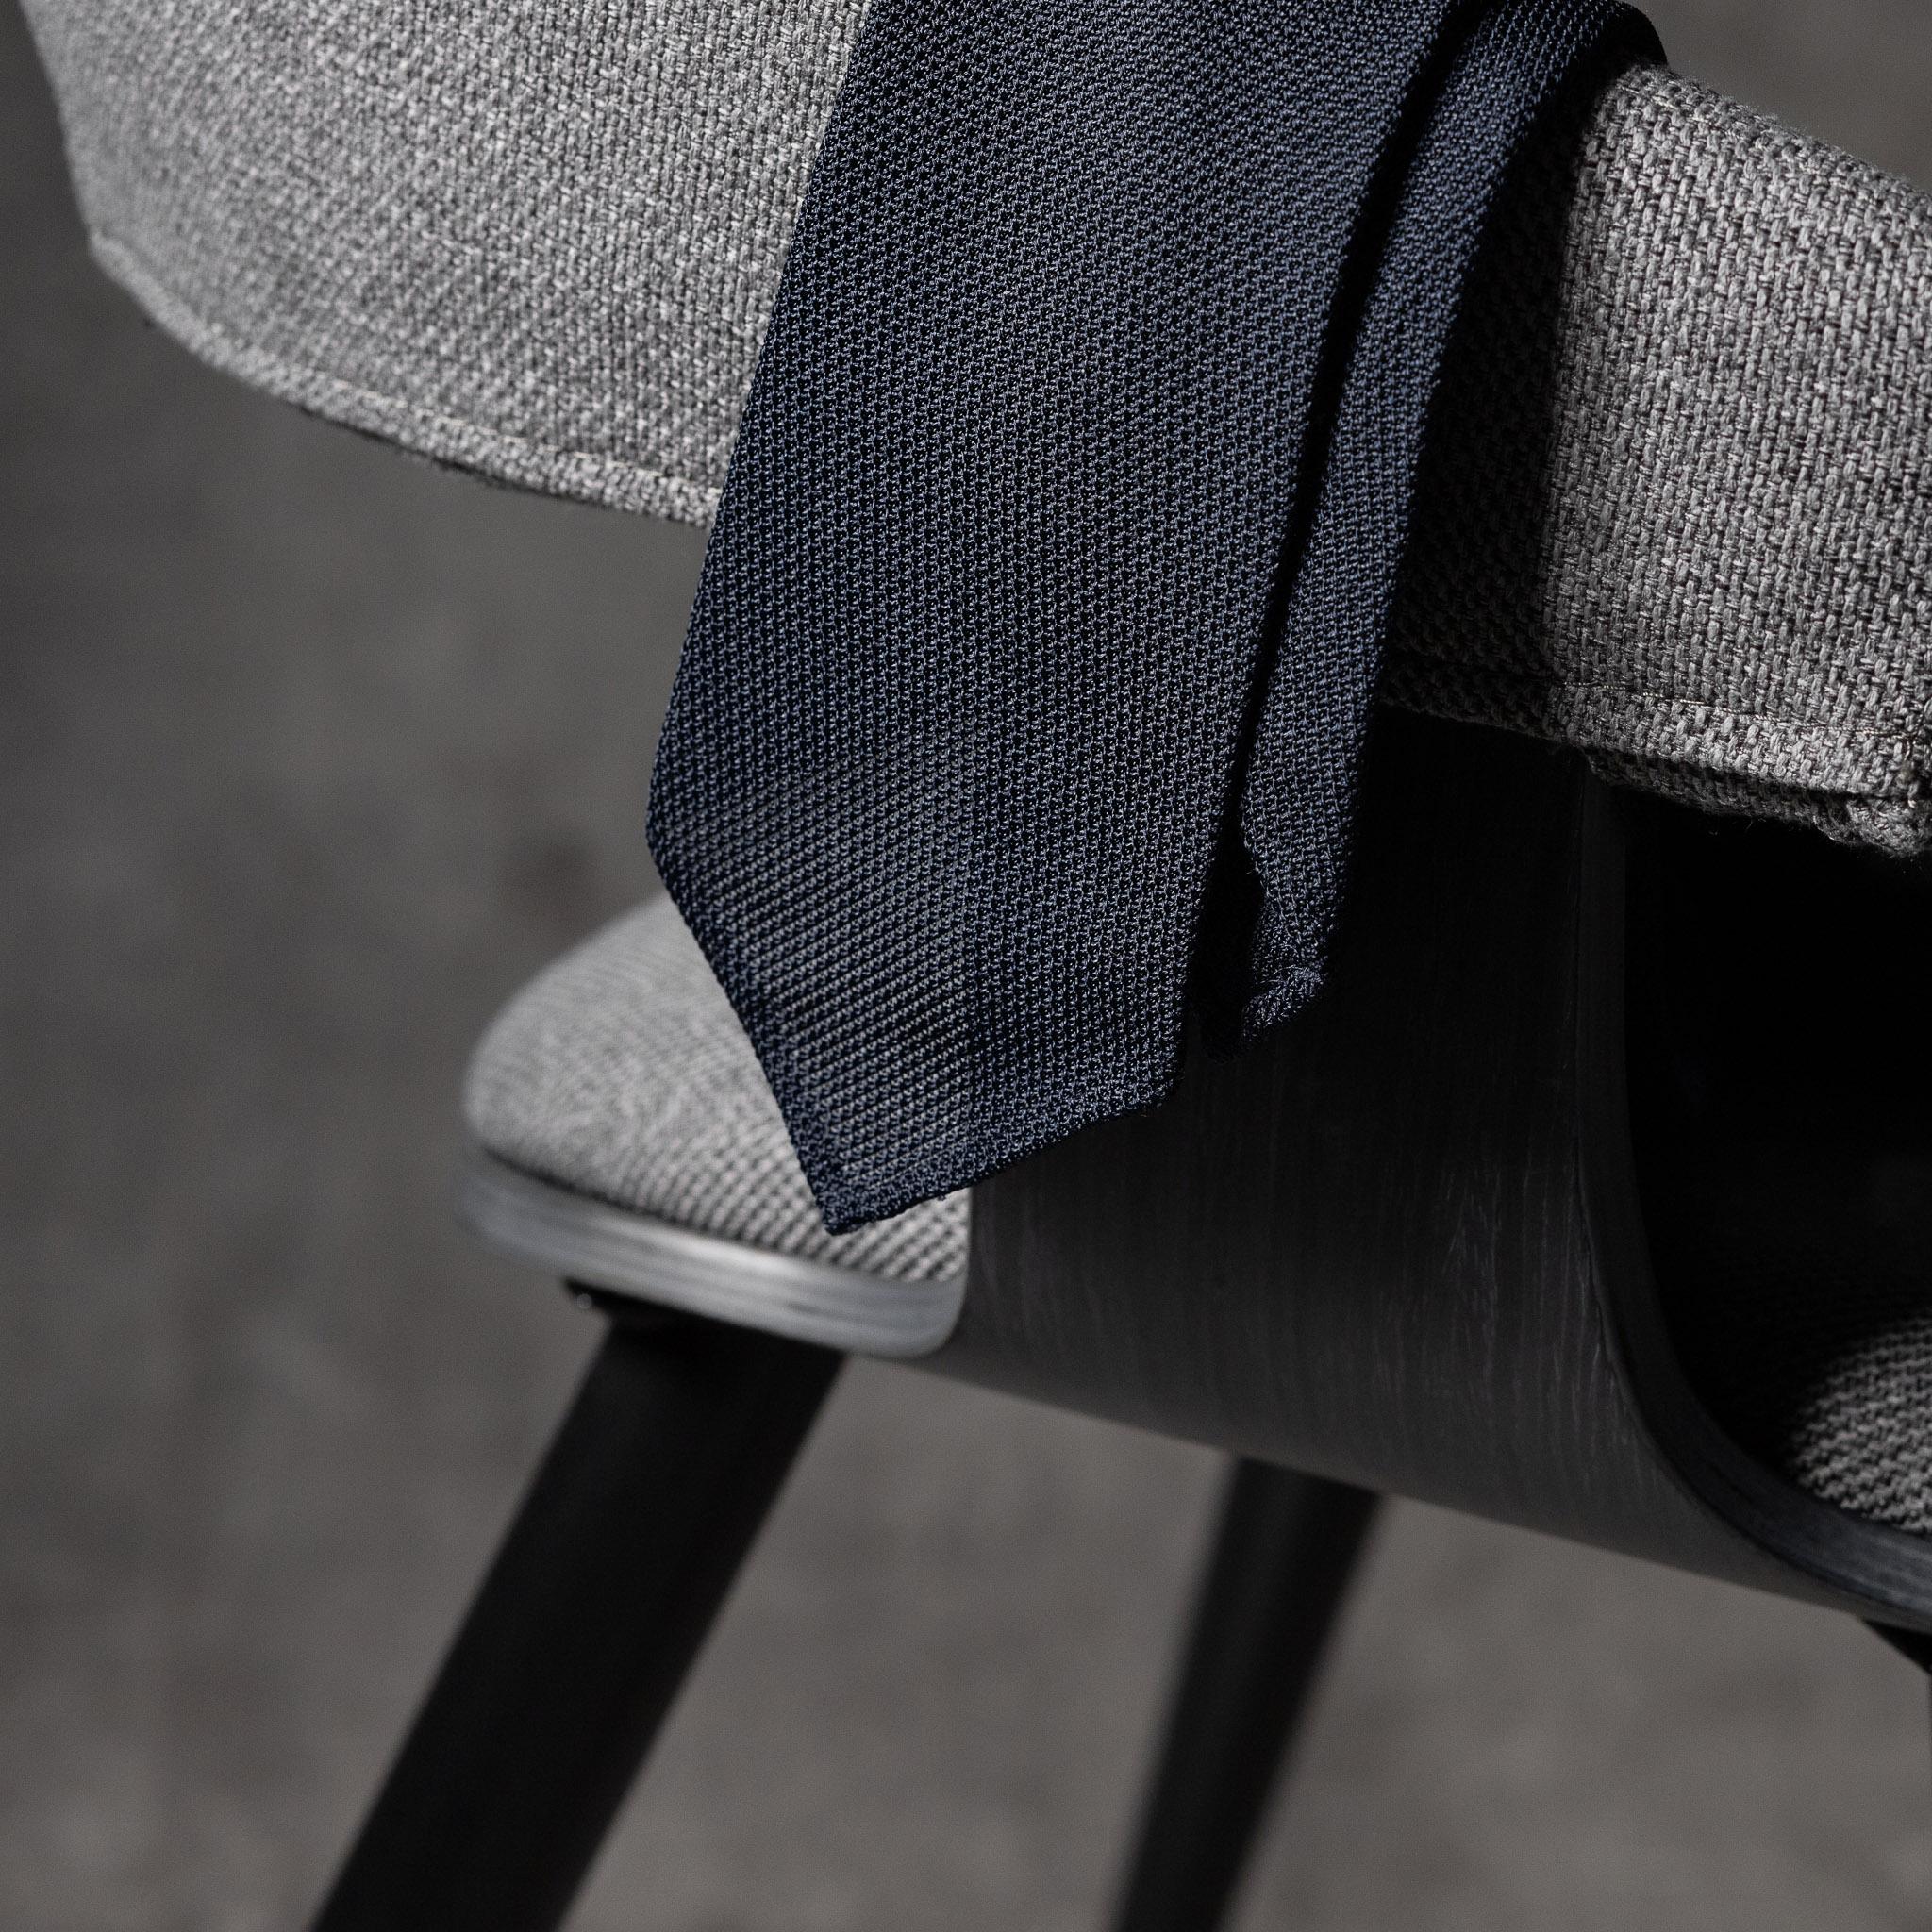 GRENADINE-0509-Tie-Initials-Corbata-Iniciales-The-Seelk-2